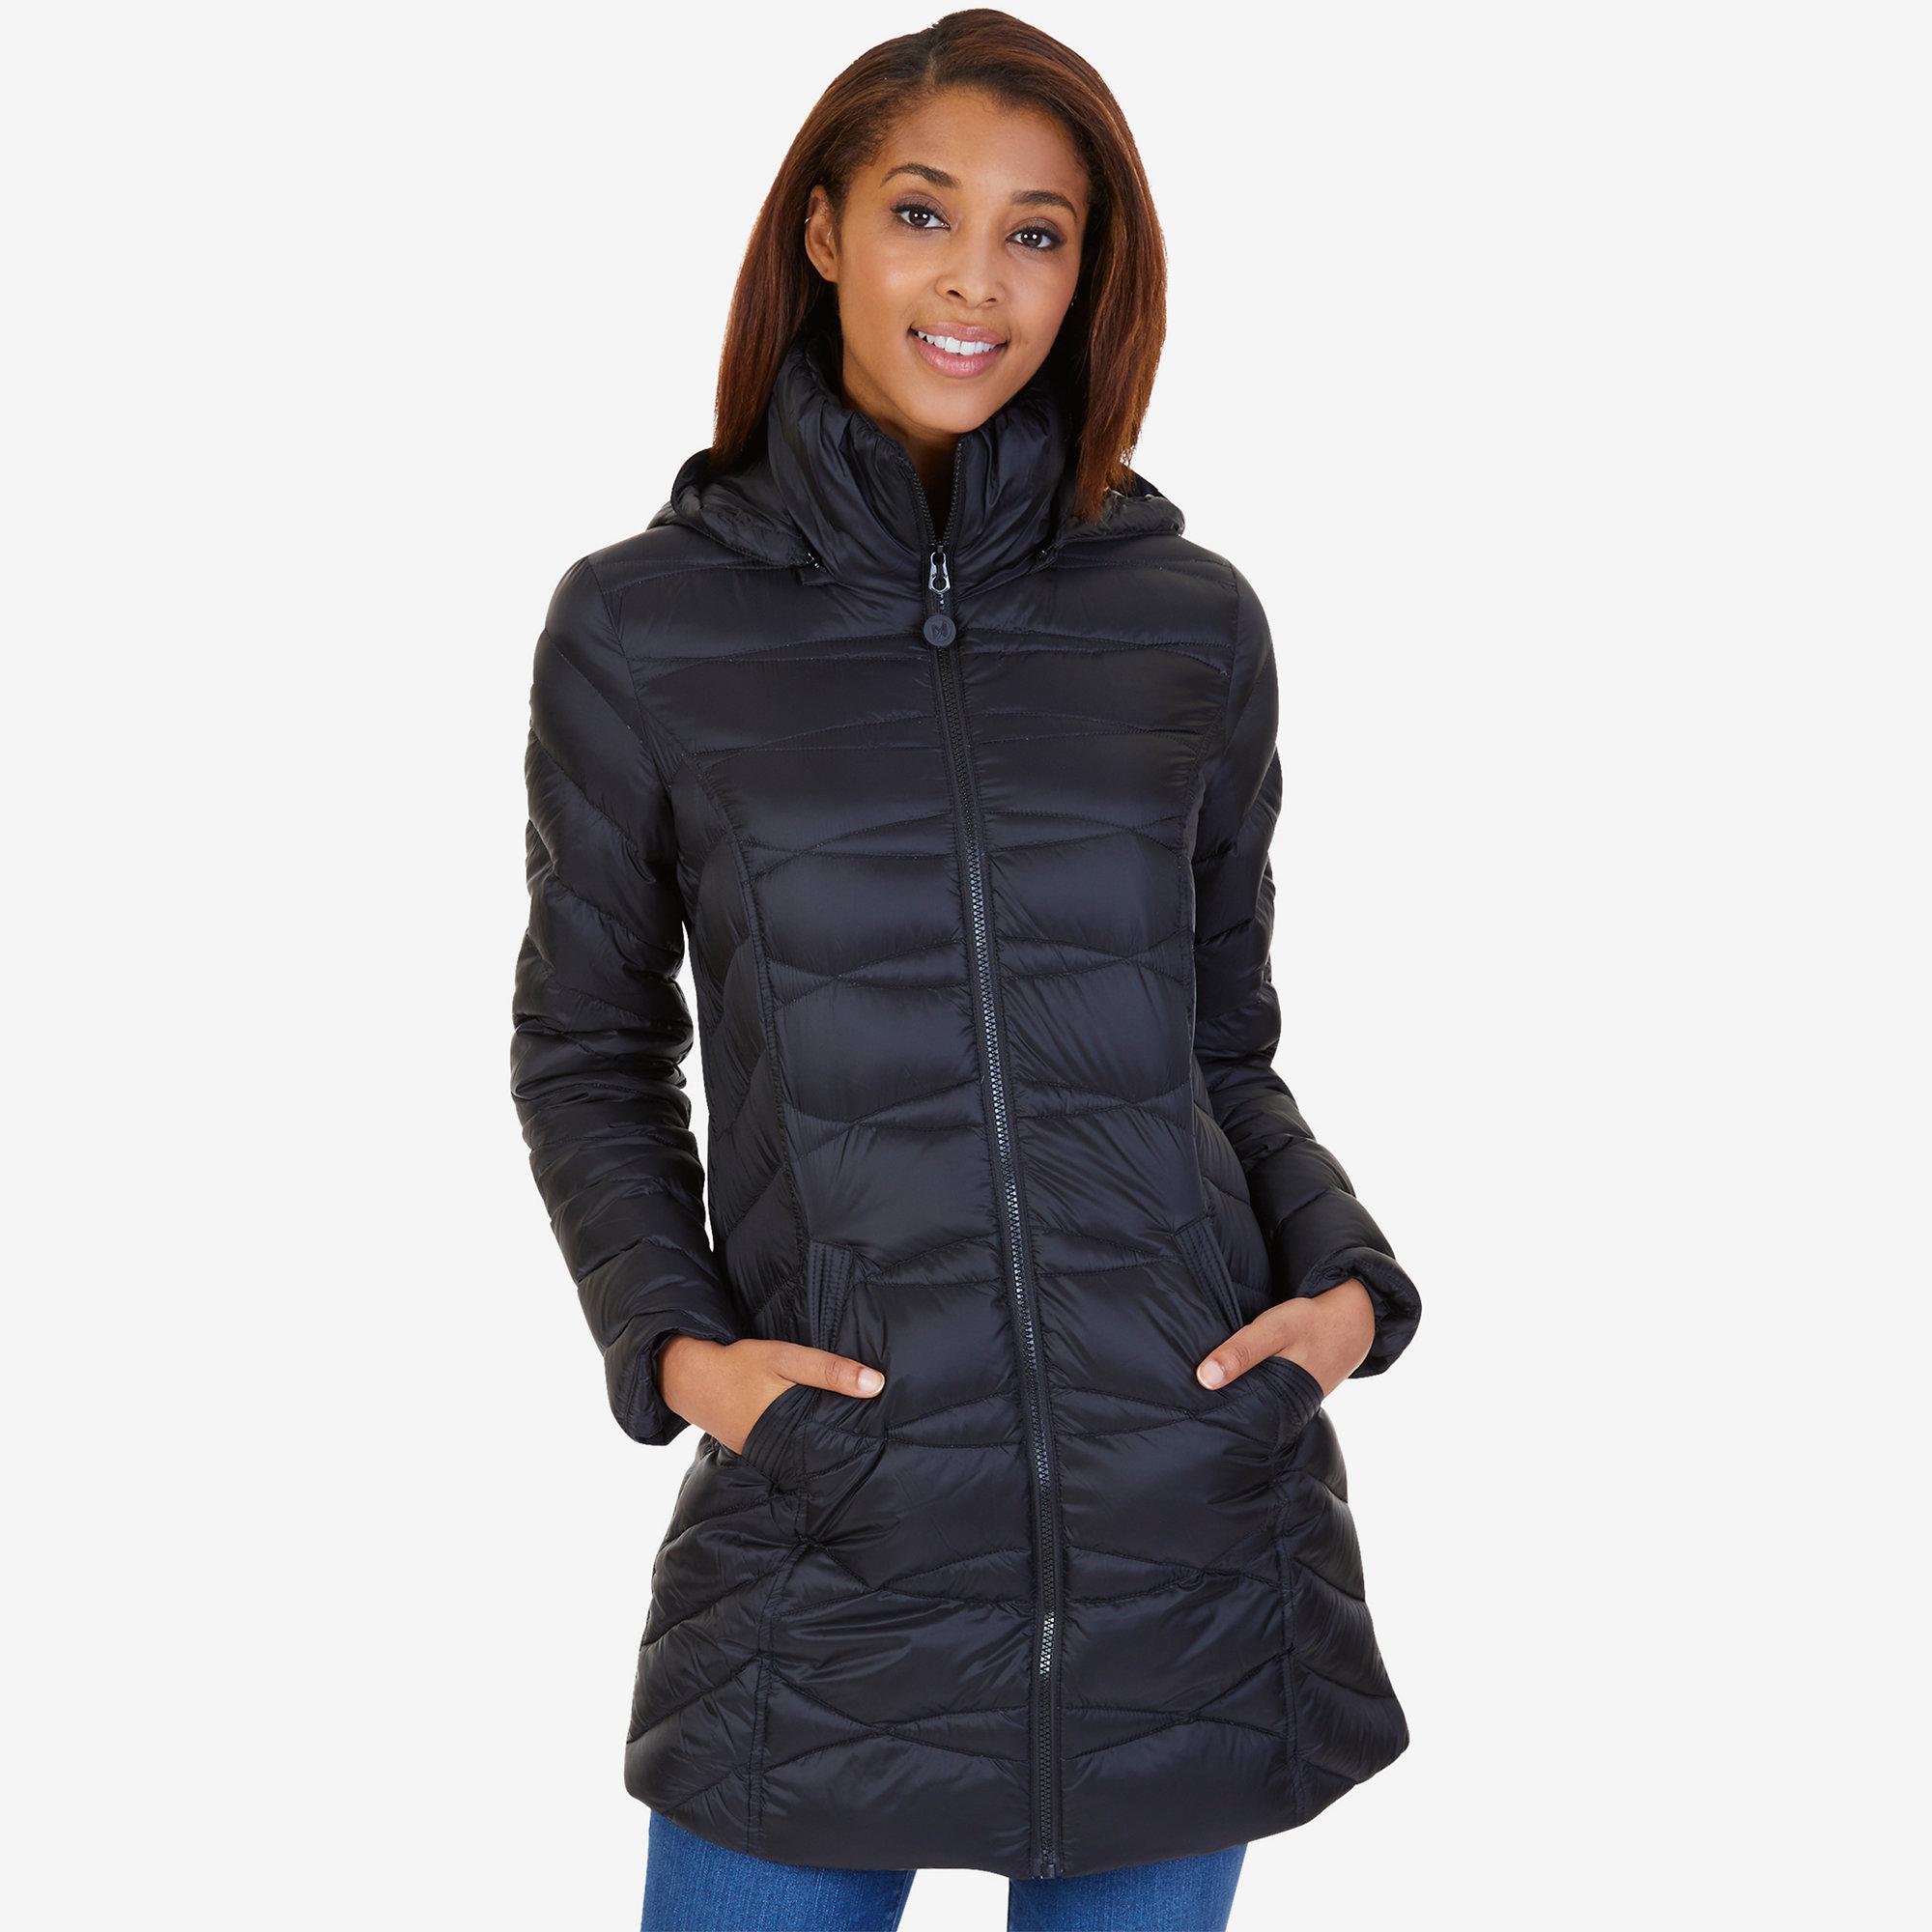 Women's Outerwear - Jackets and Coats | Nautica